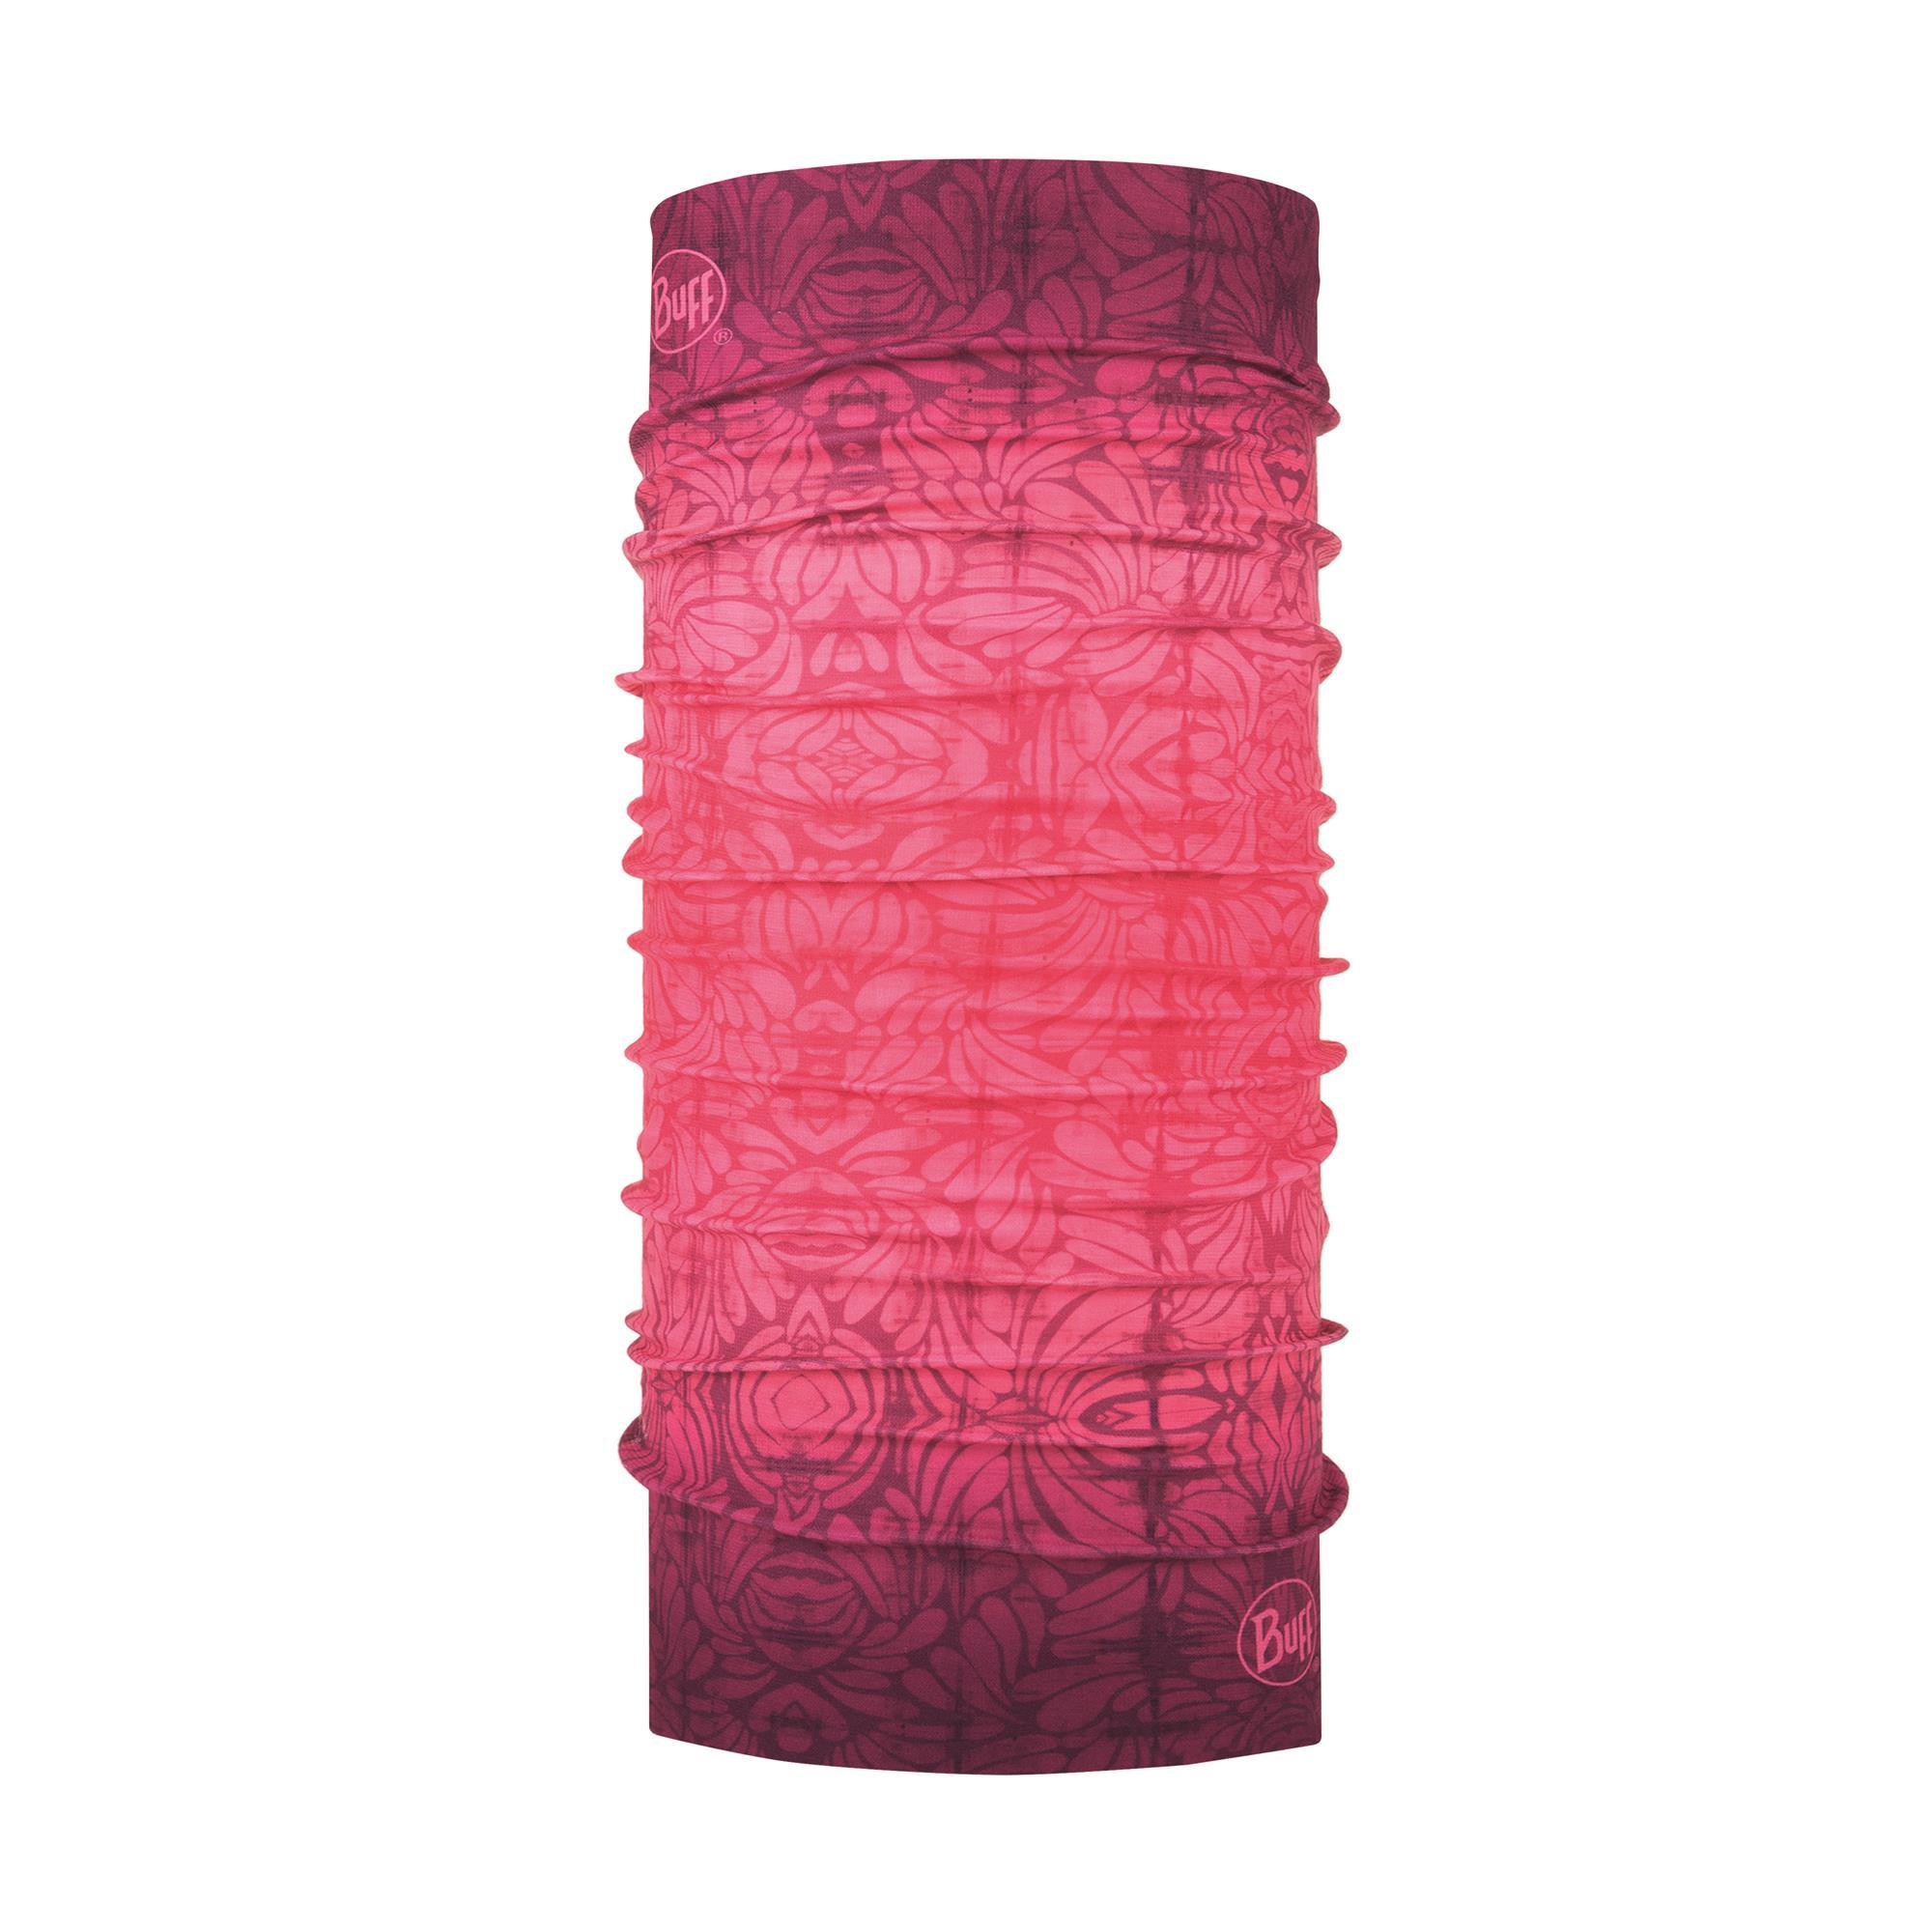 Buff Buff Original Multifunktionstuch pink,borornia pink